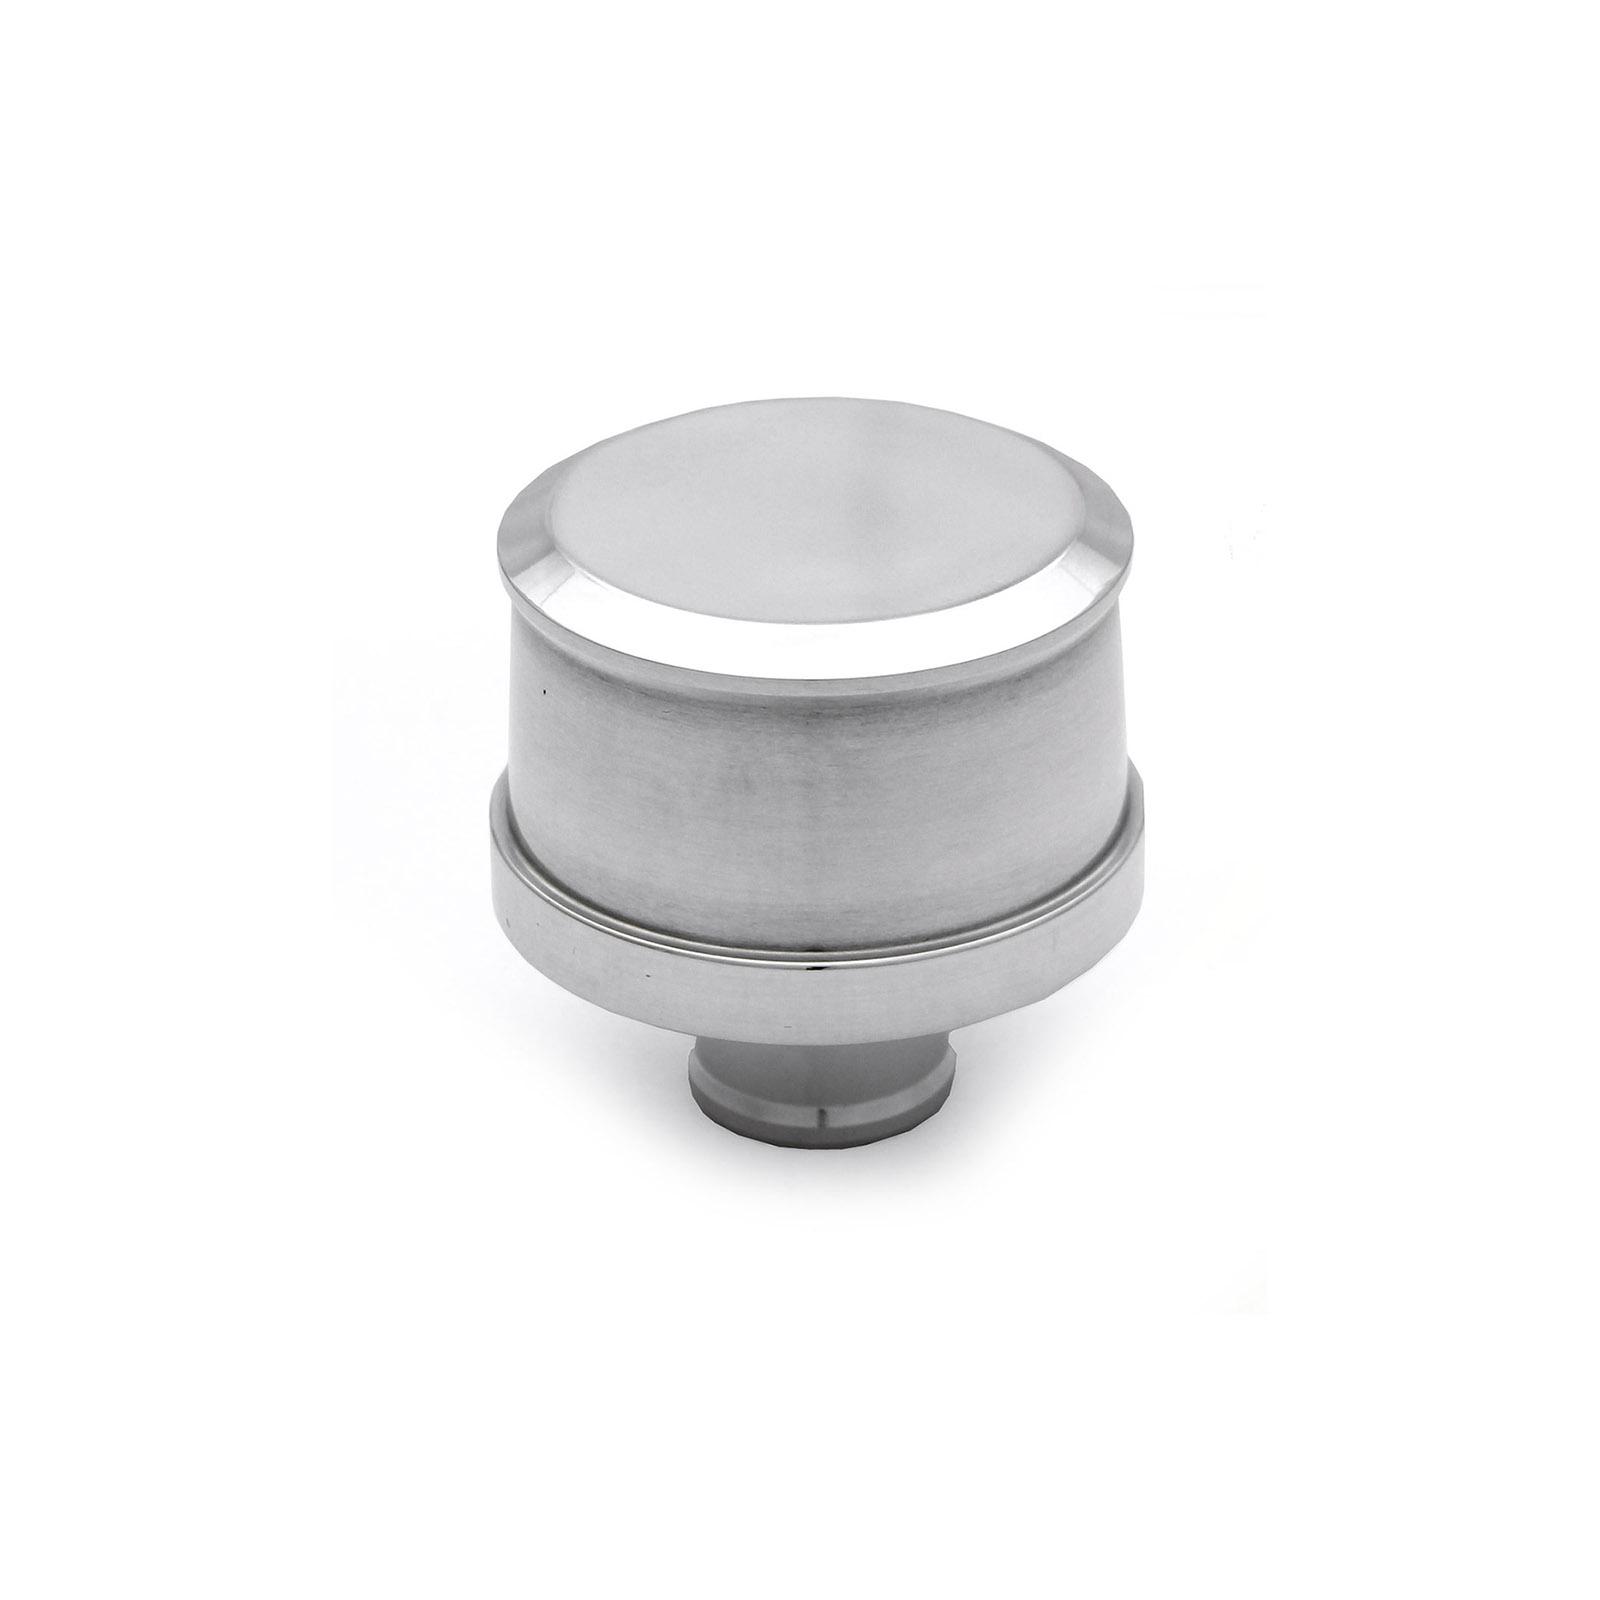 "Polished Aluminum Plain Valve Cover Breather (1"" Neck Push In)"